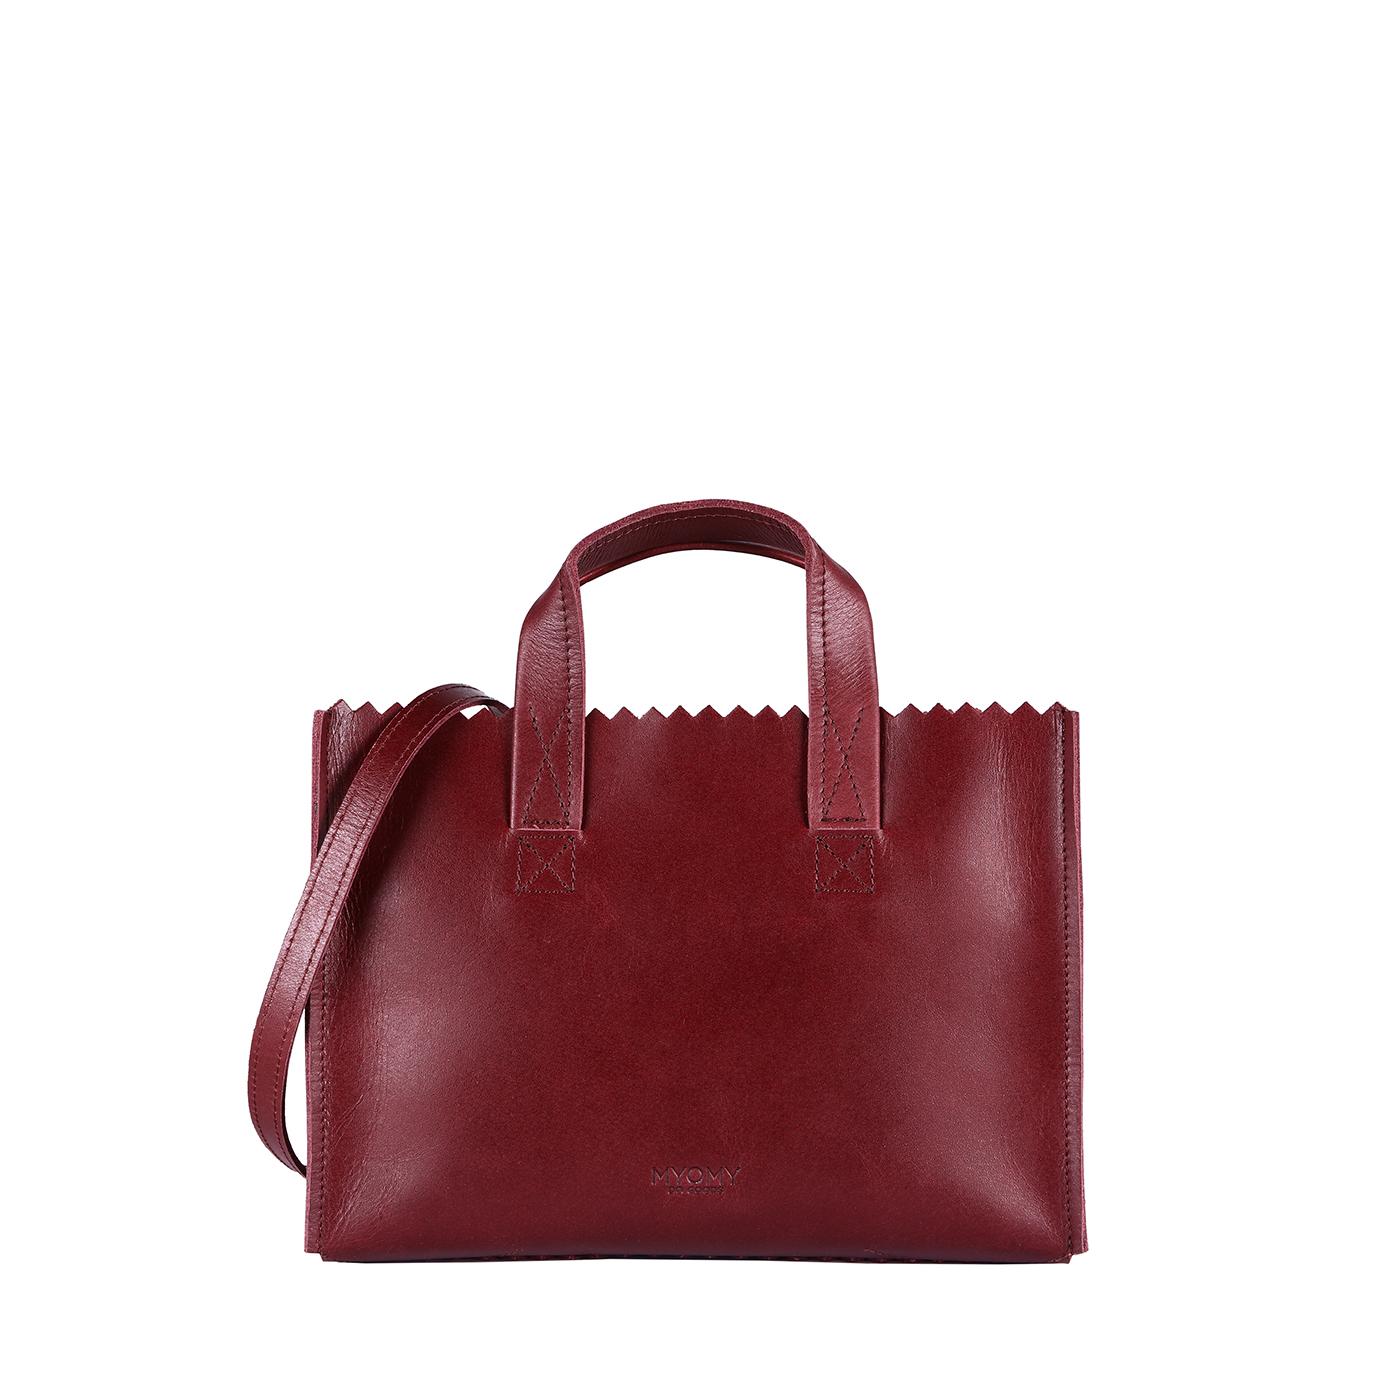 MY PAPER BAG Mini handbag cross-body - hunter waxy burgundy